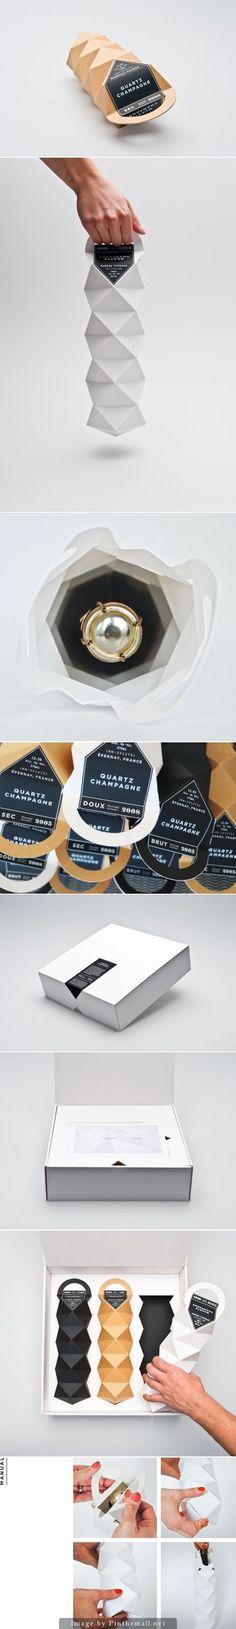 Quartz Champagne (Student Project) - Kutu, Paketleme, Ambalaj - Quartz Champagne (Student Project), Designers: Max Molitor & Cajza Nyden – www. Smart Packaging, Bottle Packaging, Brand Packaging, Wine Design, Bottle Design, Label Design, Package Design, Graphic Design, Champagne